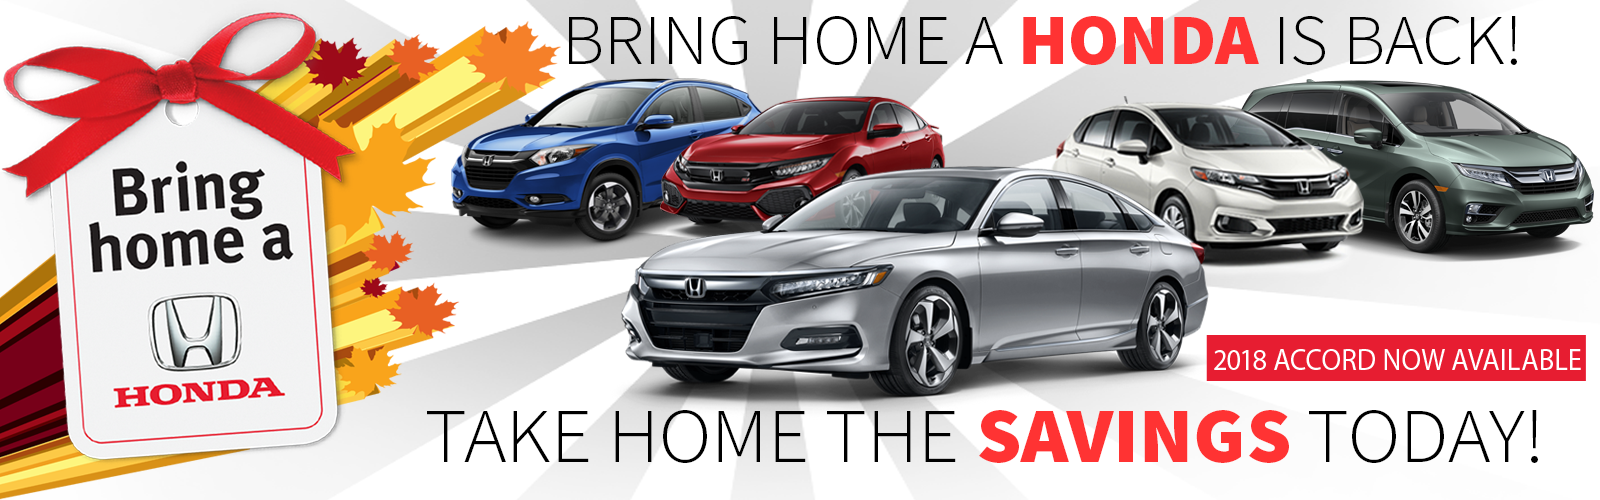 Bring Home a Honda from Okotoks Honda, South Calgary